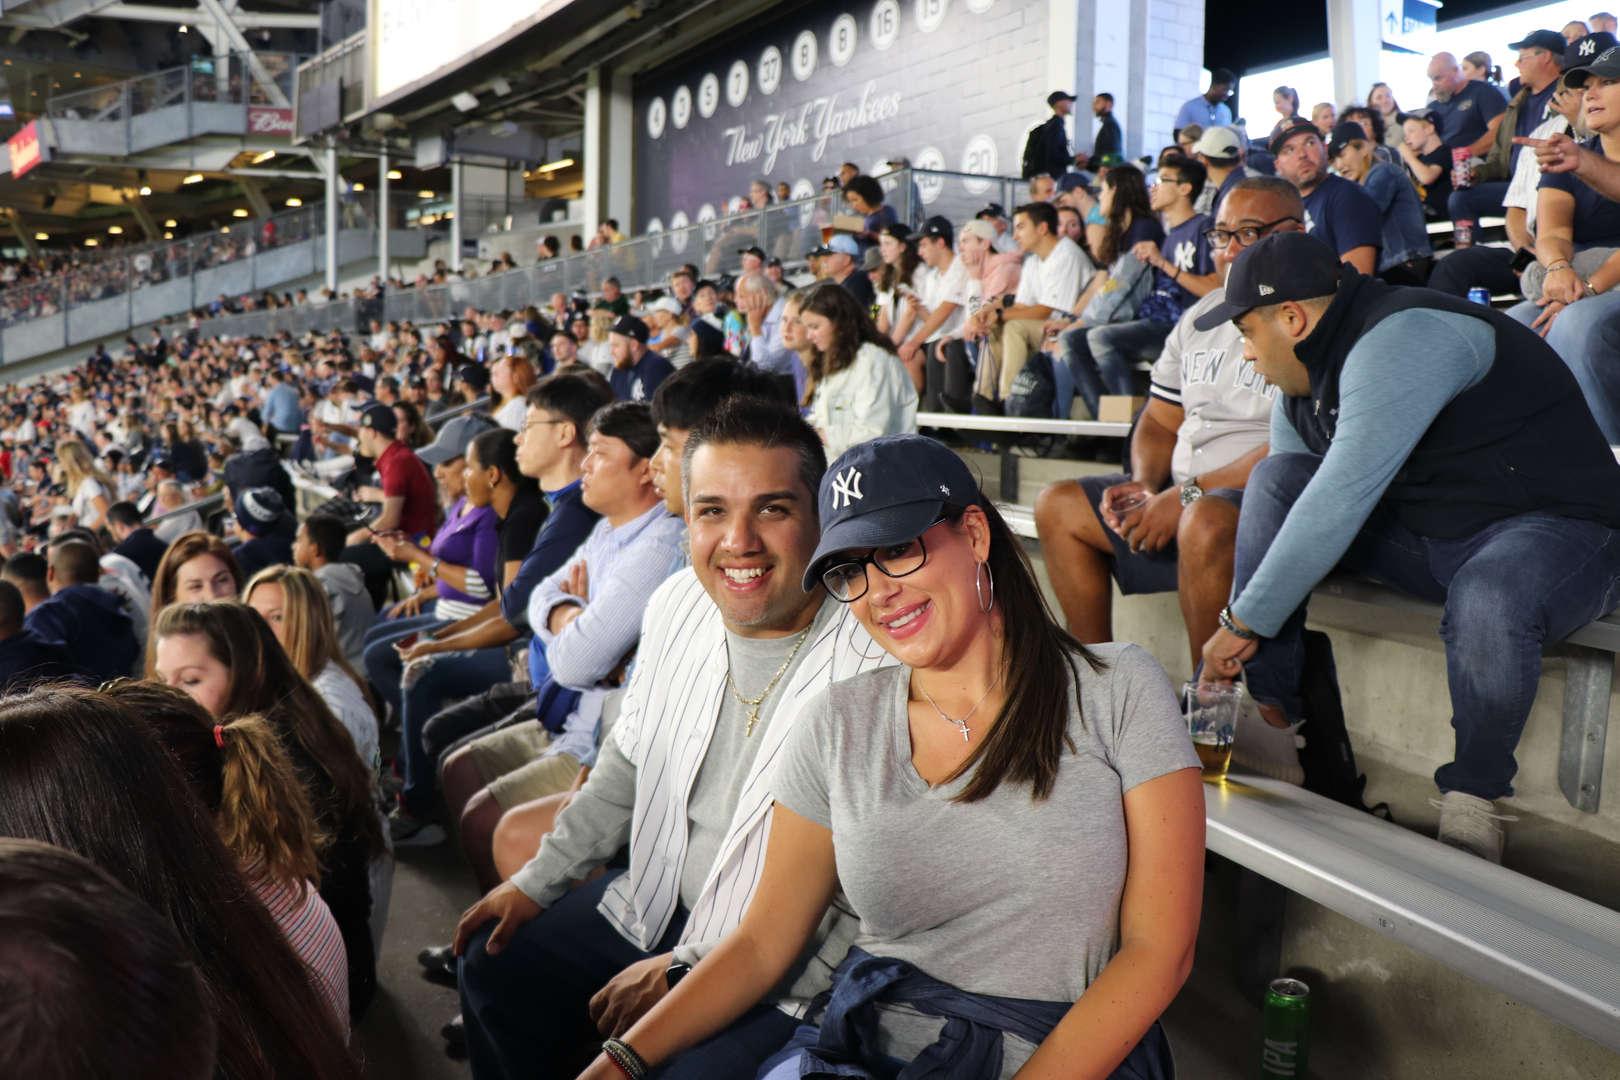 Teachers at the Yankee game.